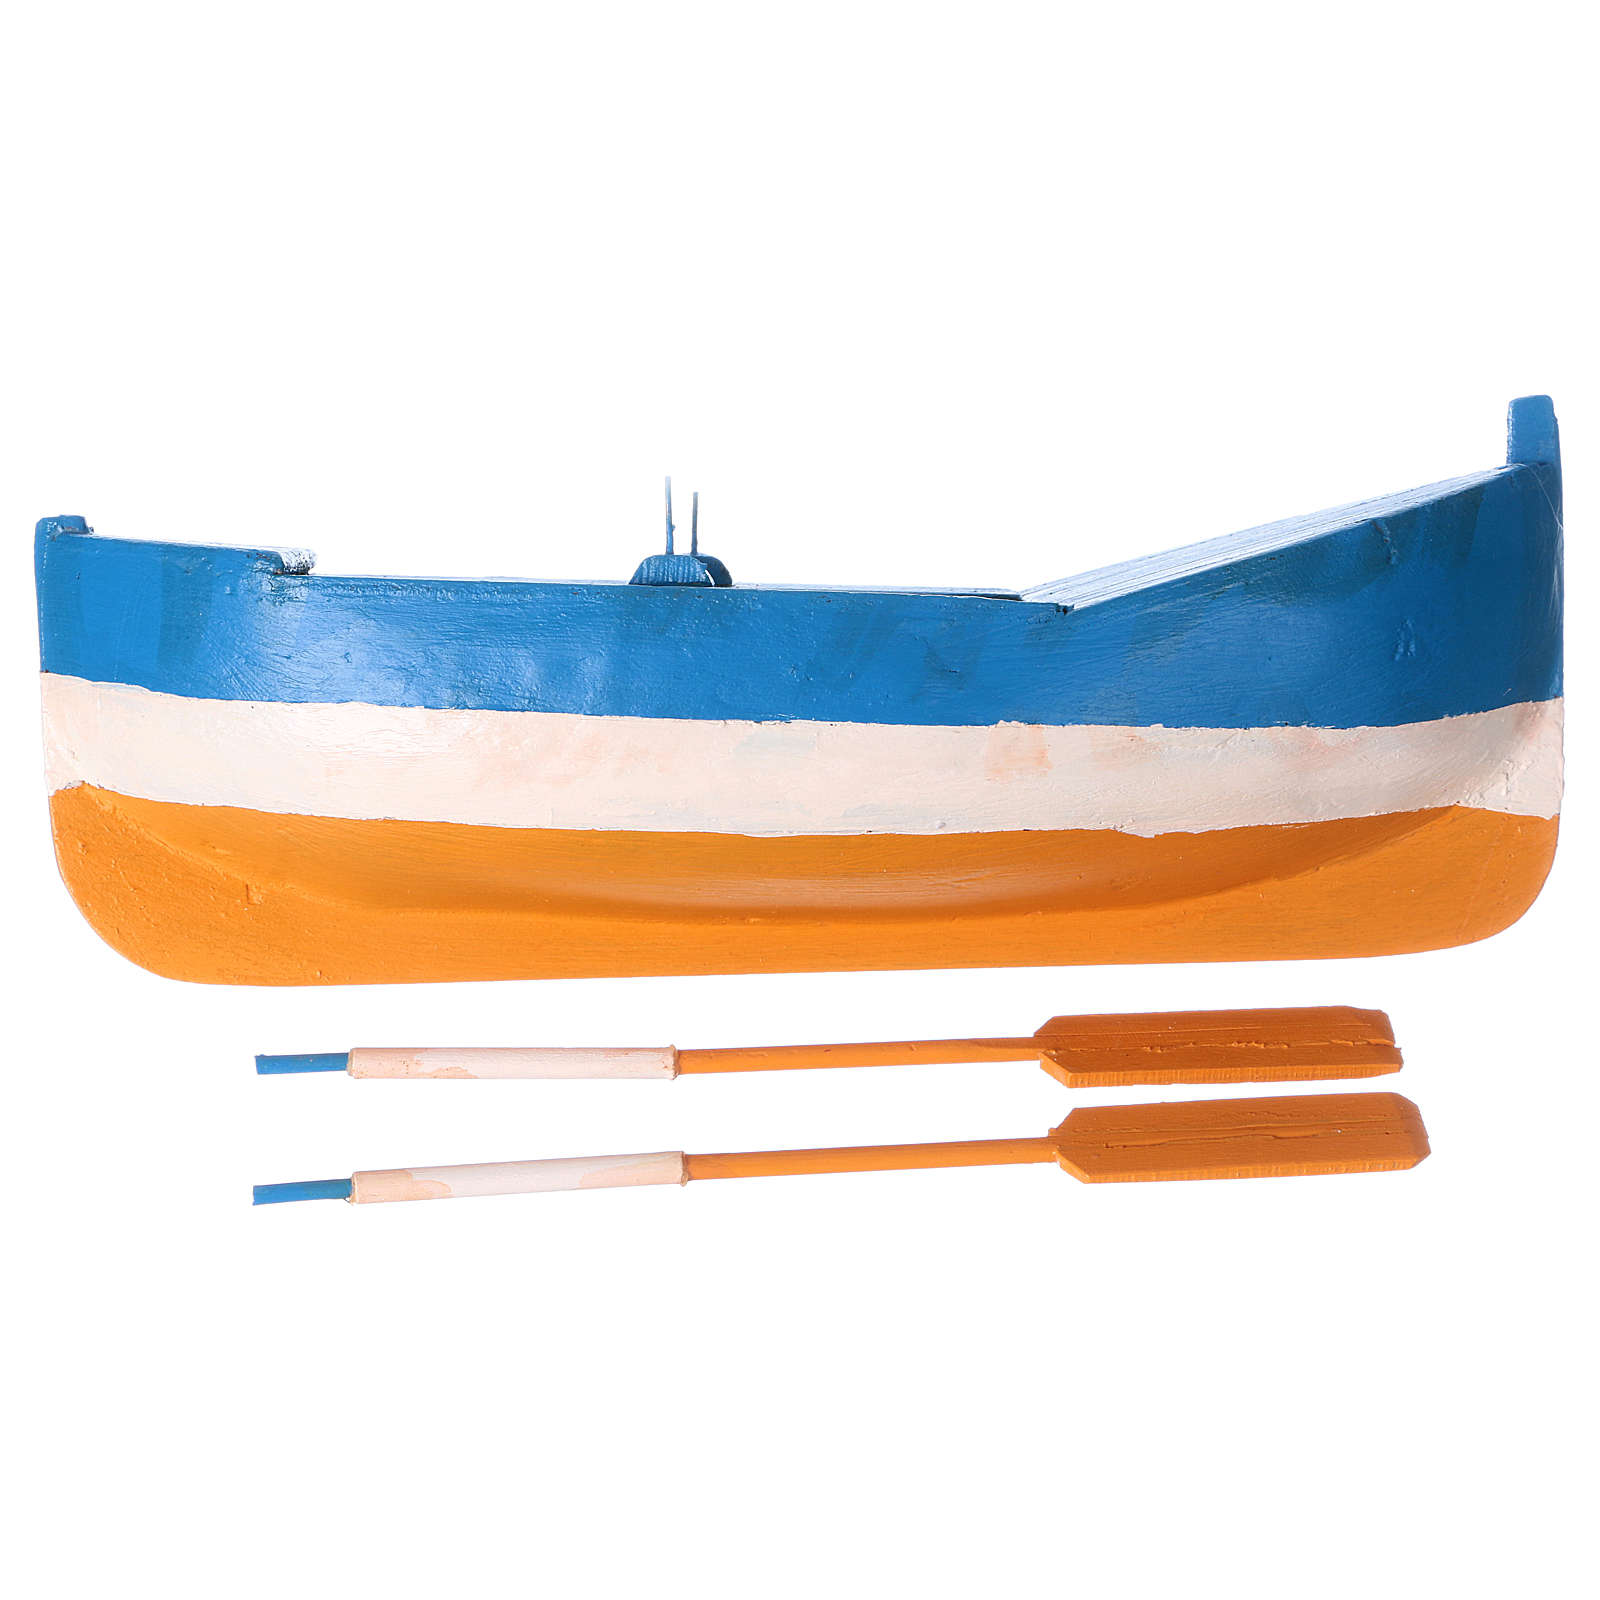 Bote de remos en Miniatura 8,5x25x11 cm 4